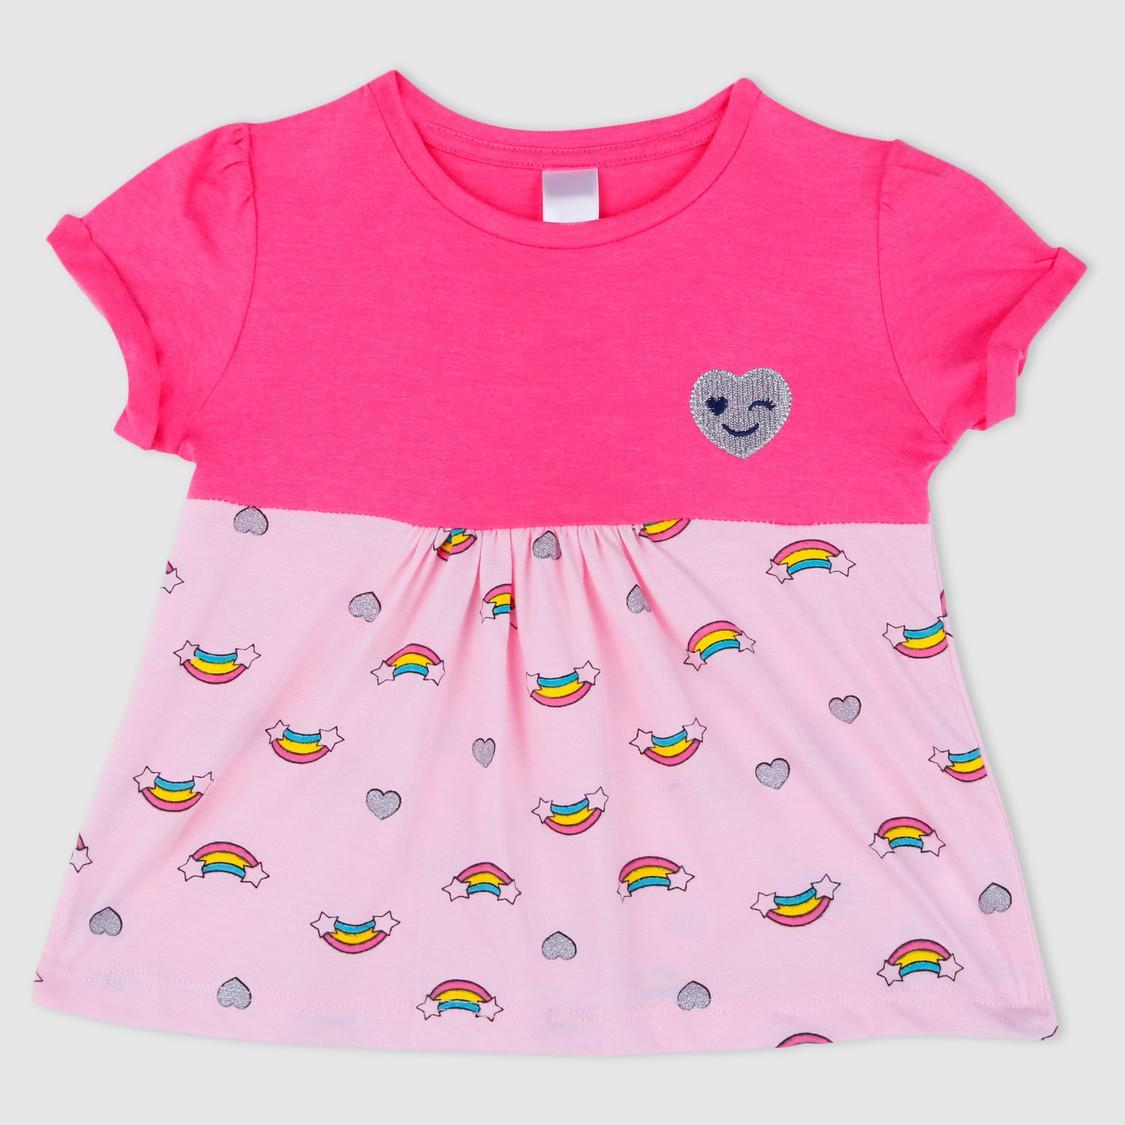 Rainbow Print Short Sleeves T-Shirt